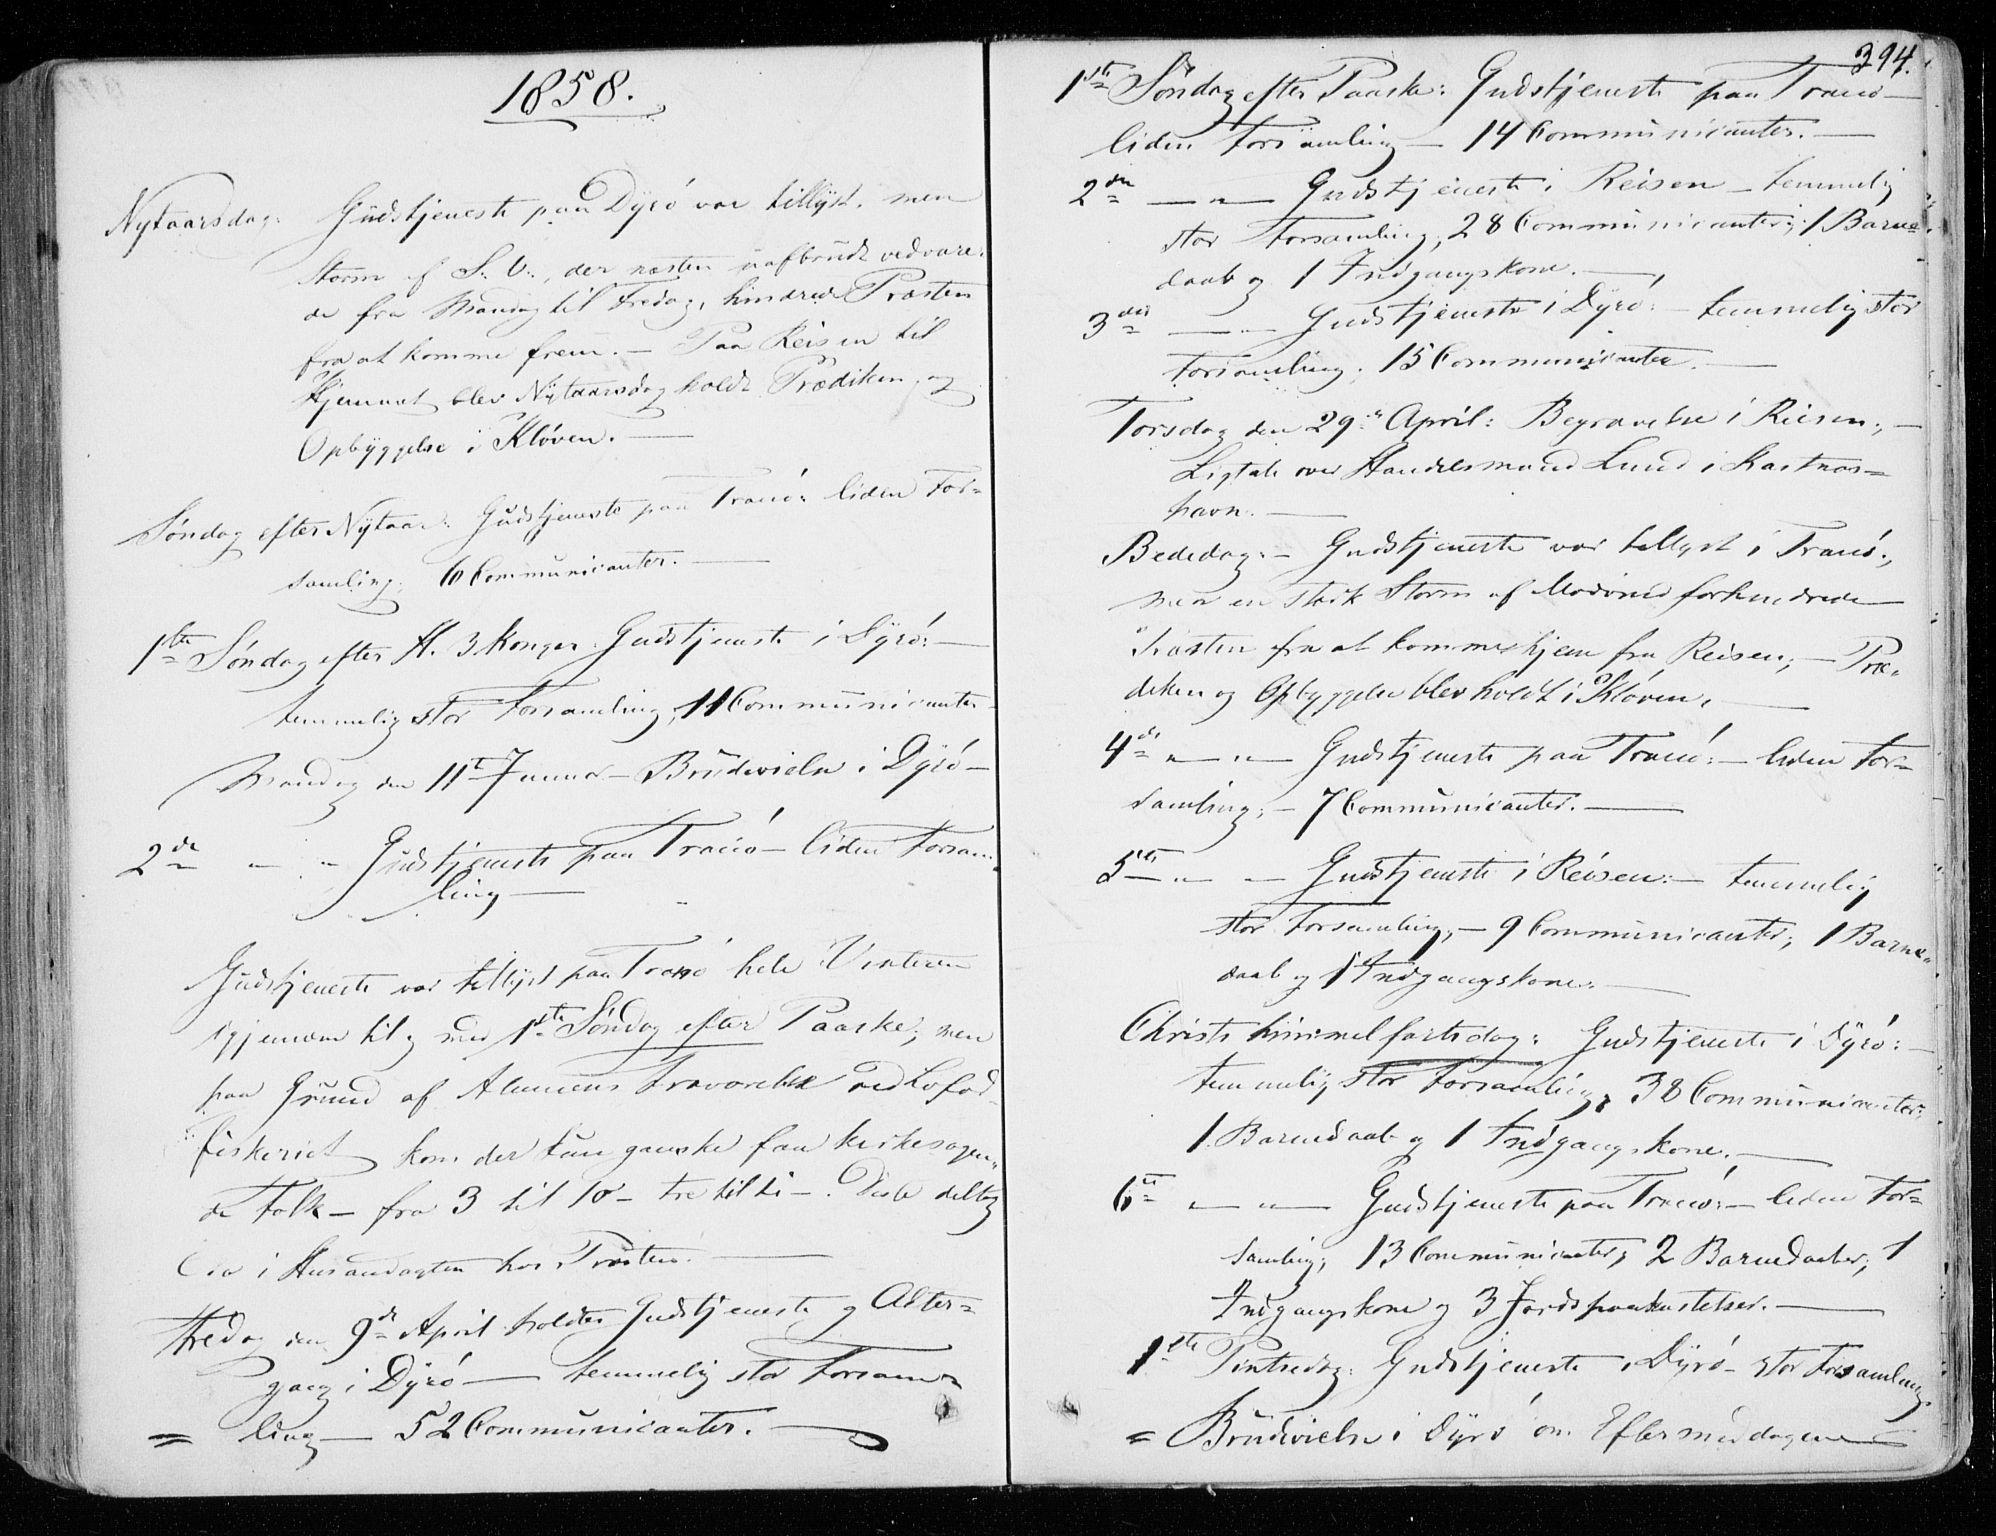 SATØ, Tranøy sokneprestkontor, I/Ia/Iaa/L0007kirke: Ministerialbok nr. 7, 1856-1866, s. 394